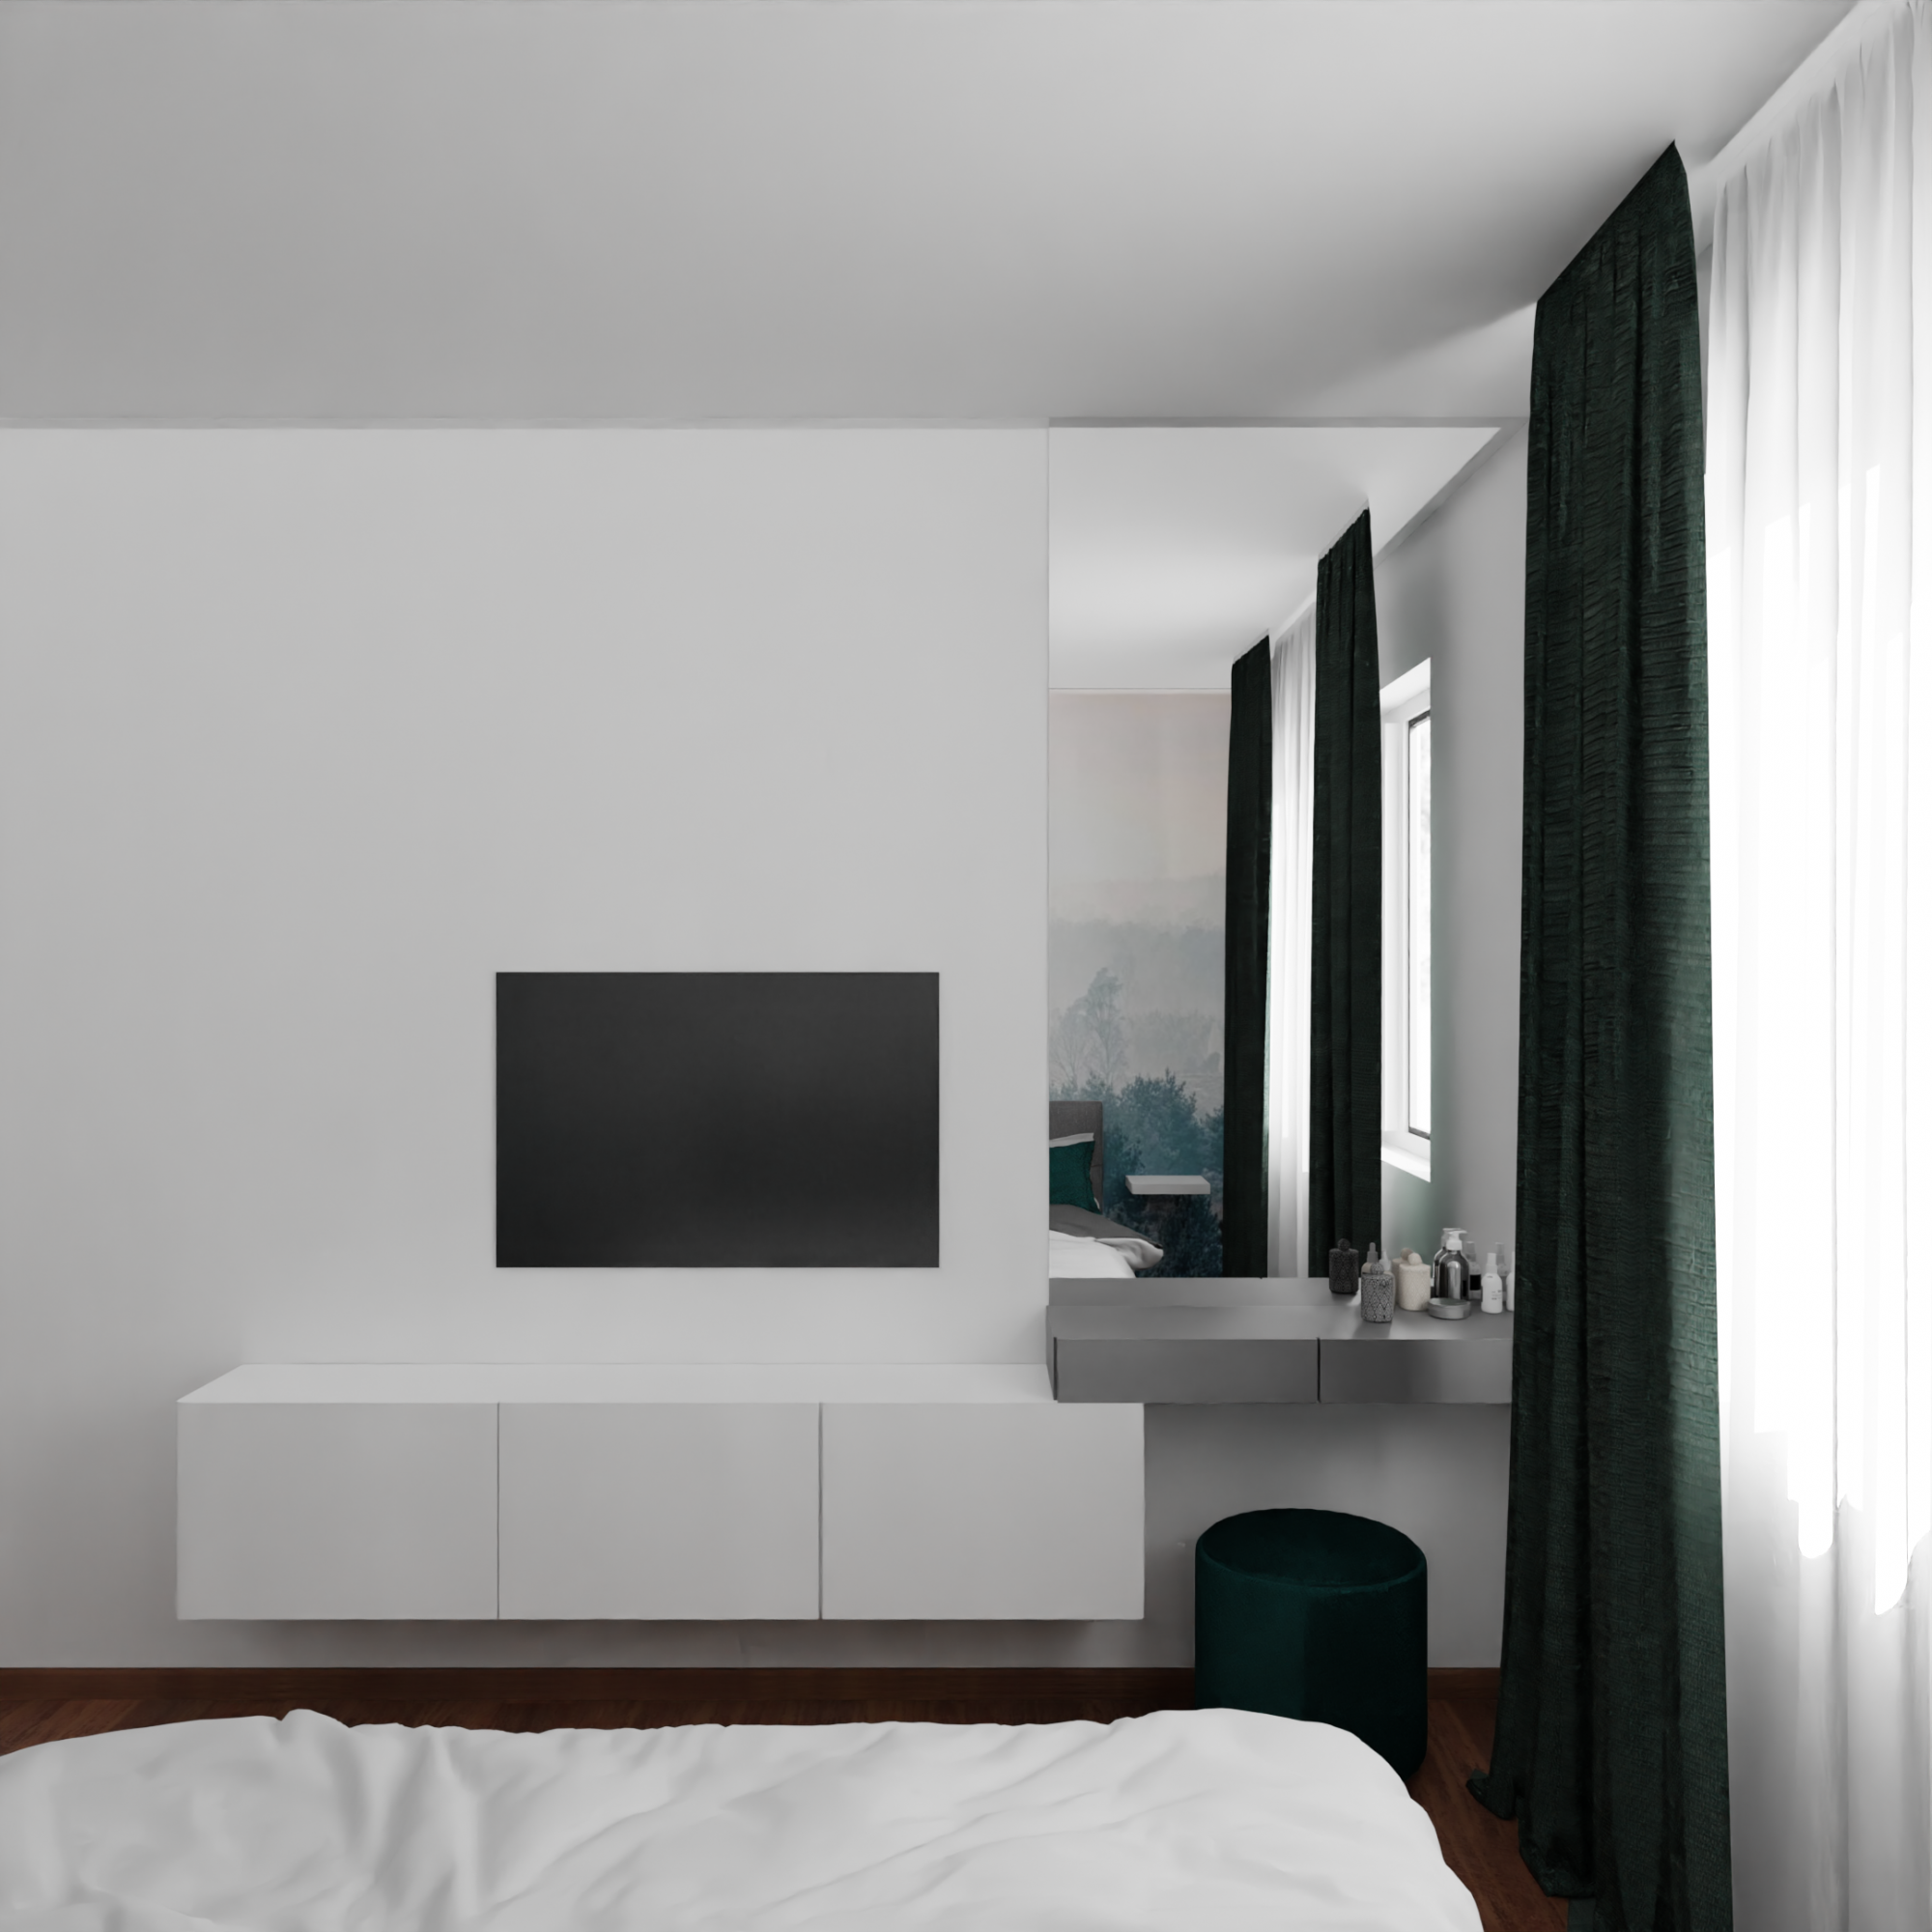 v2 dormitor comoda1